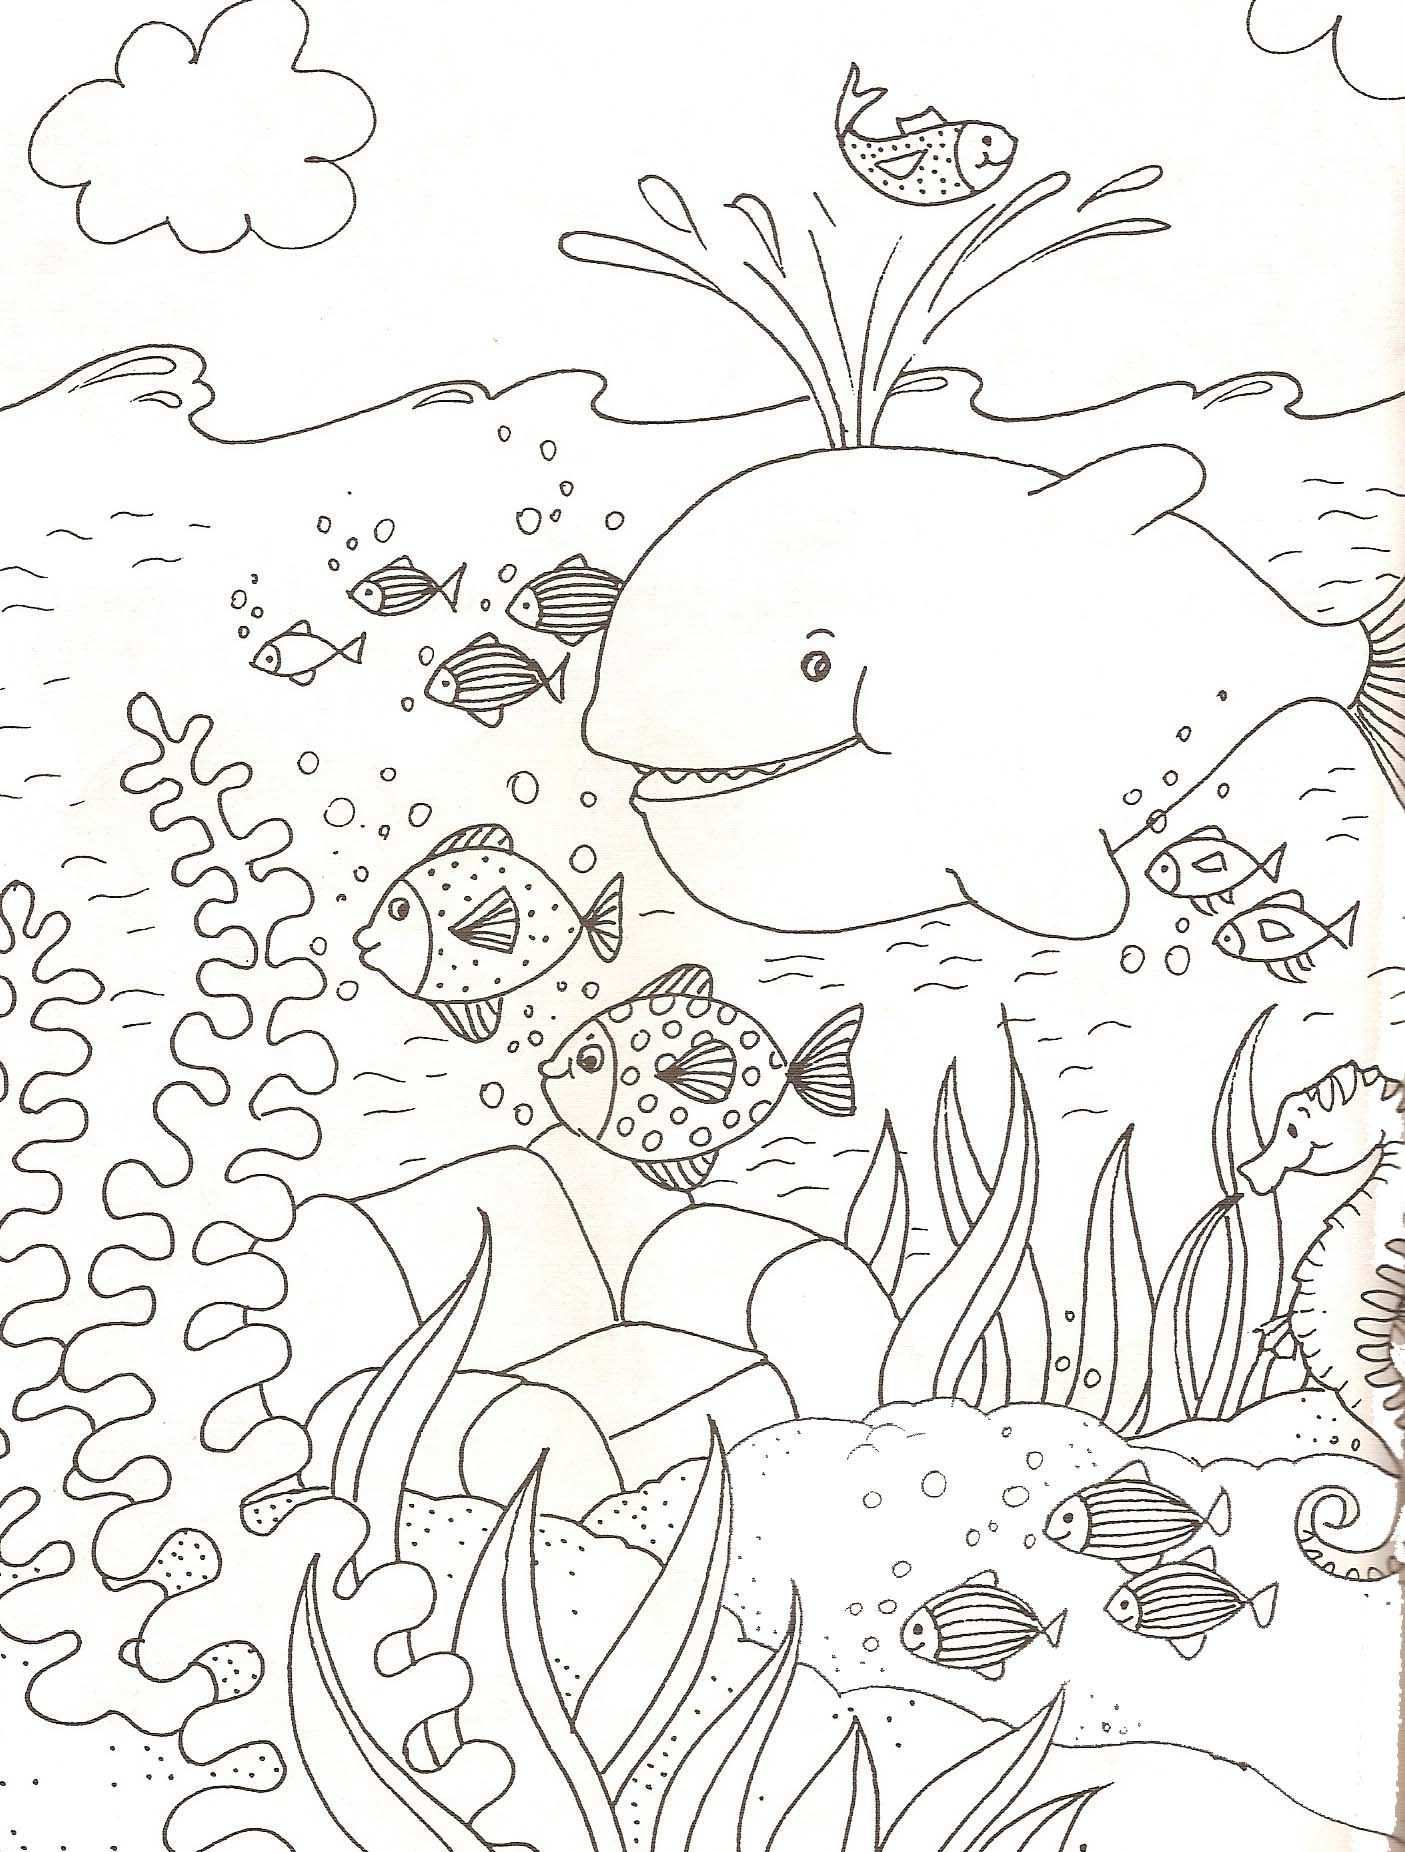 Animaux Marins Kleurplaten Dieren Kleurplaten Onderwater Knutselen